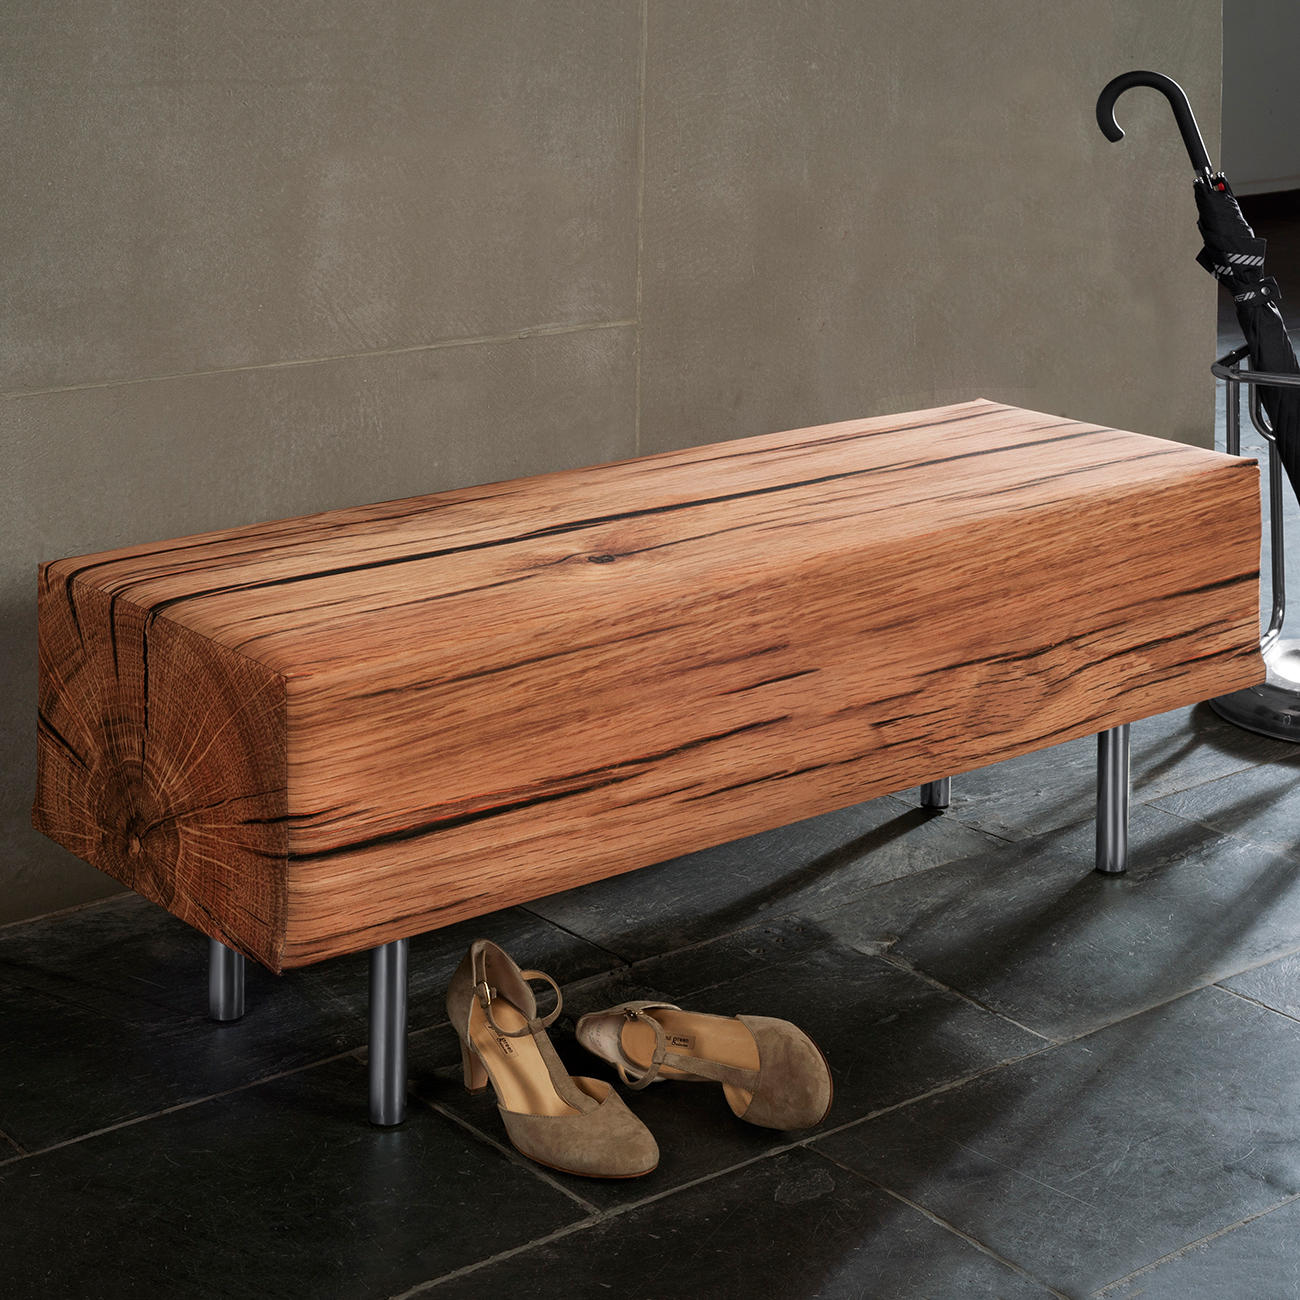 sitzbank in holzoptik 3 jahre garantie pro idee. Black Bedroom Furniture Sets. Home Design Ideas